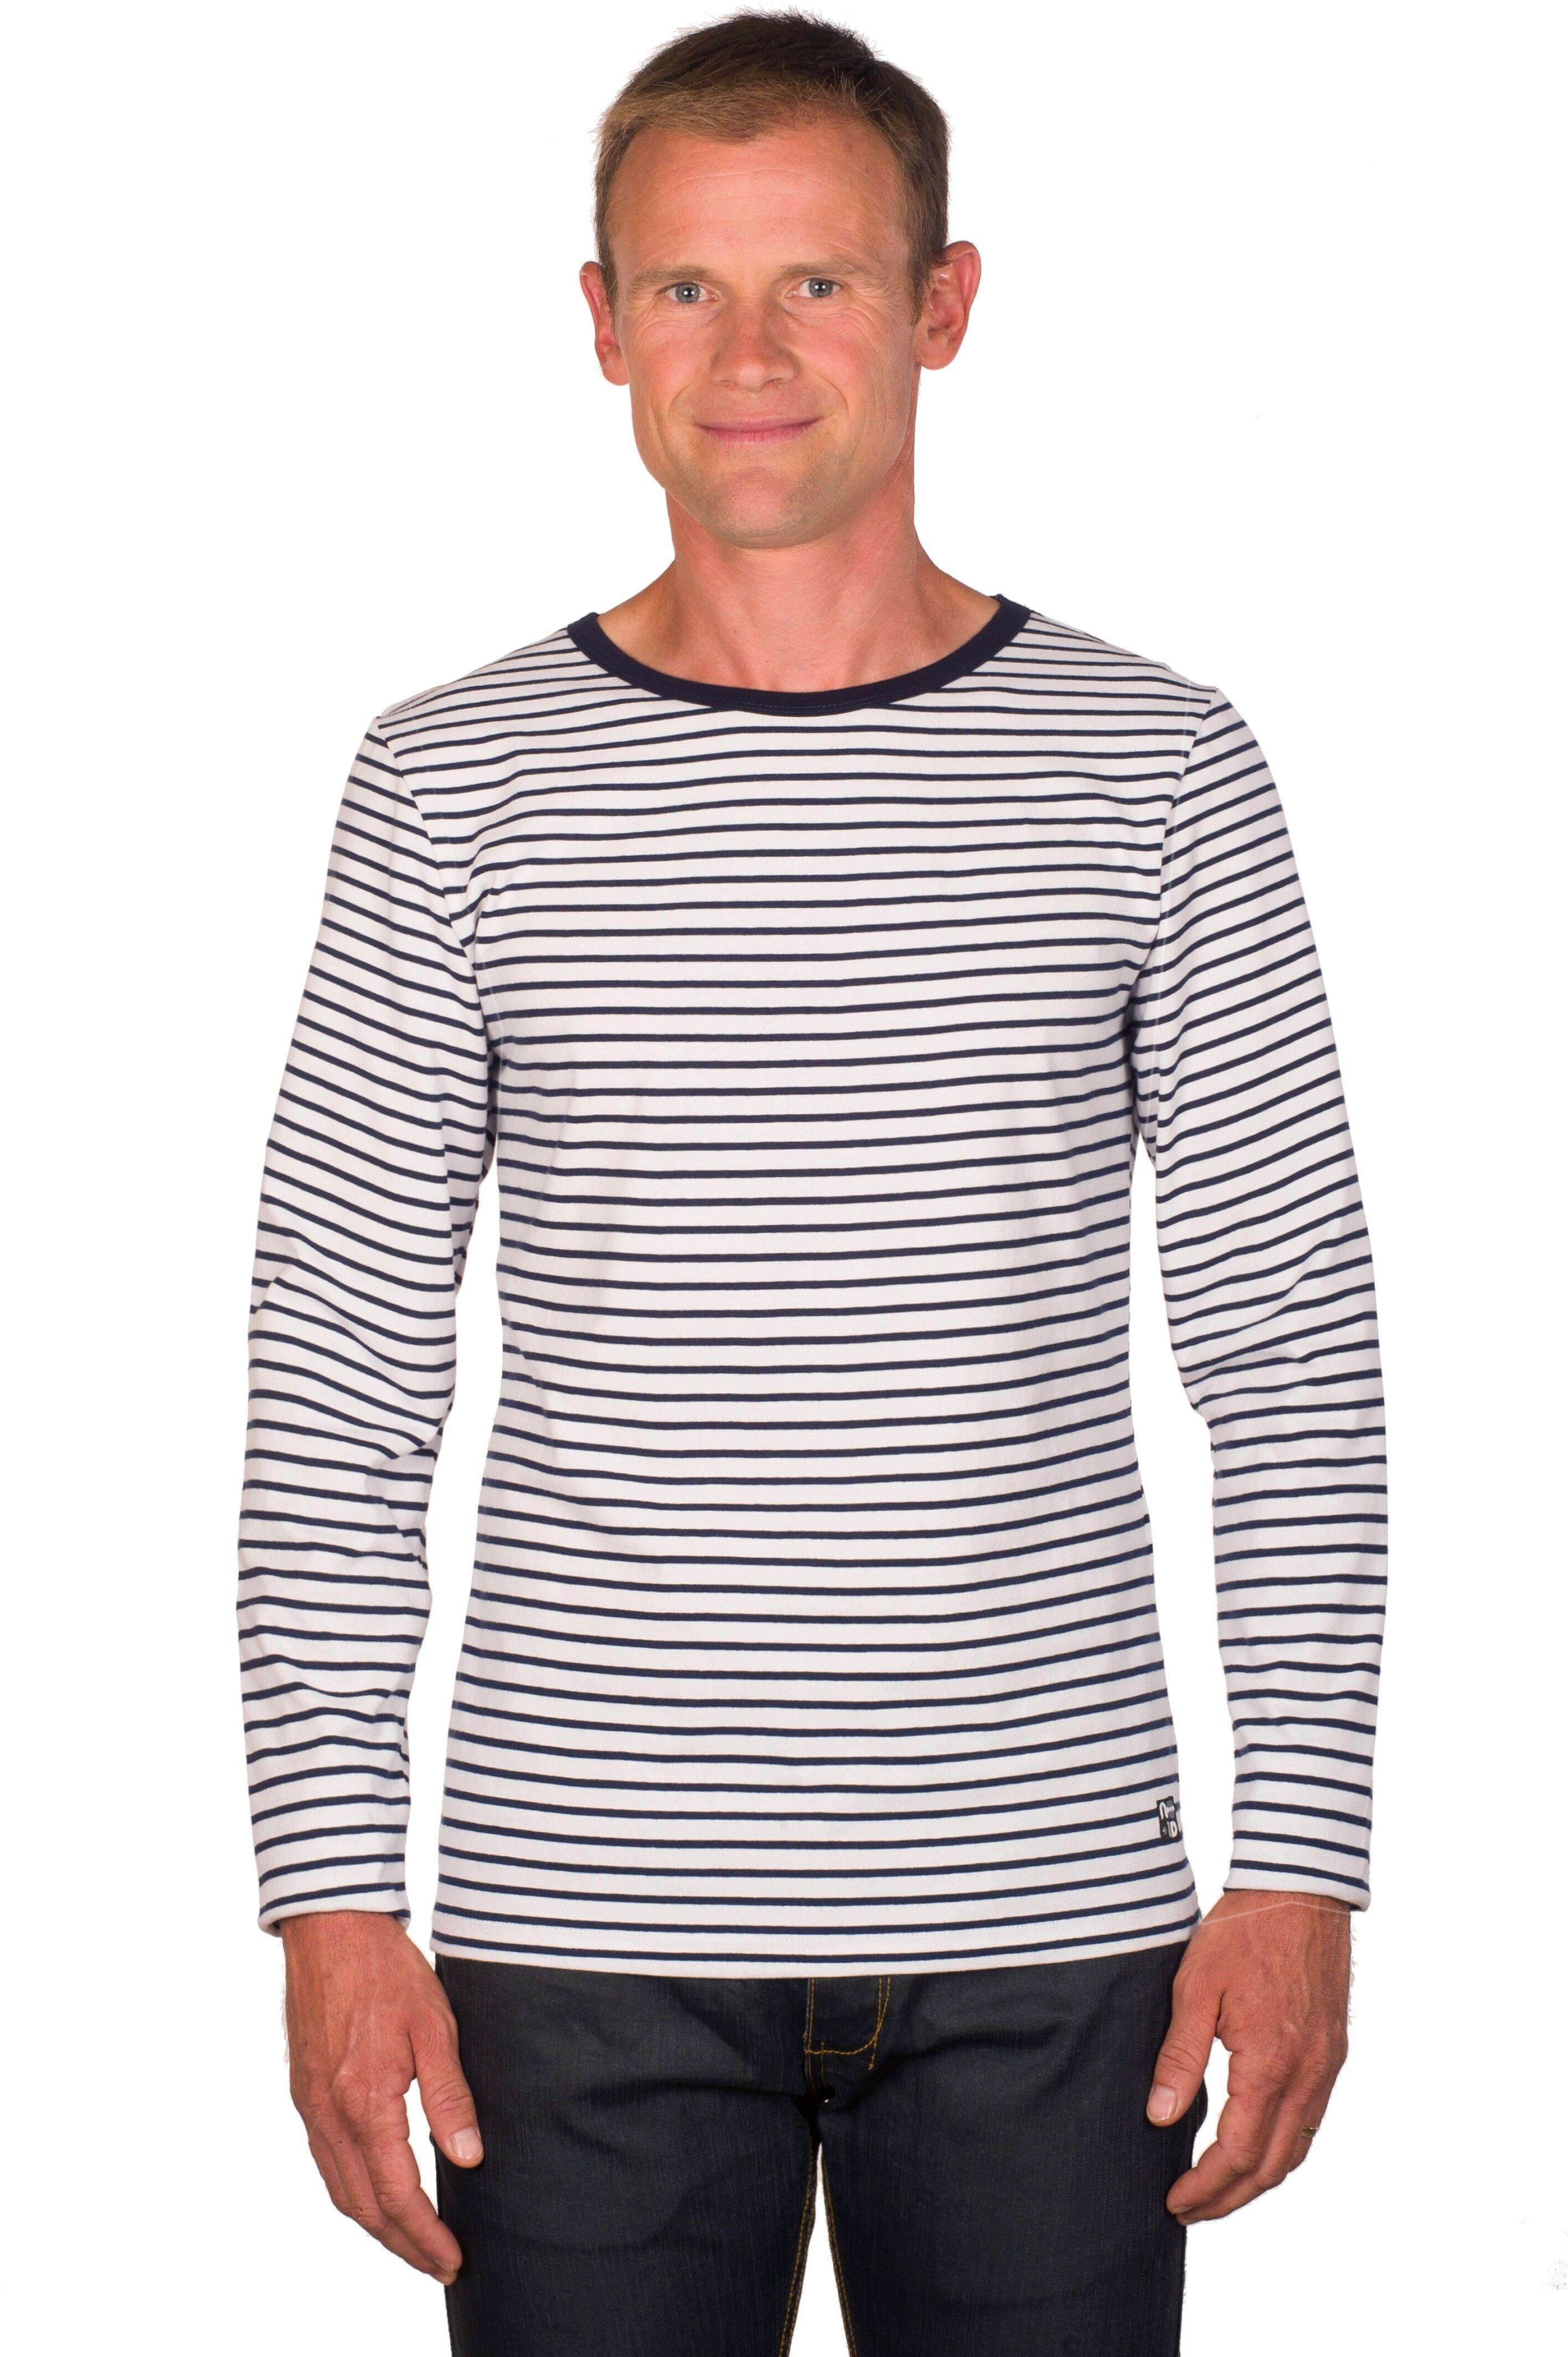 tee shirt homme marini re blanc bleu manches longues ugholin. Black Bedroom Furniture Sets. Home Design Ideas